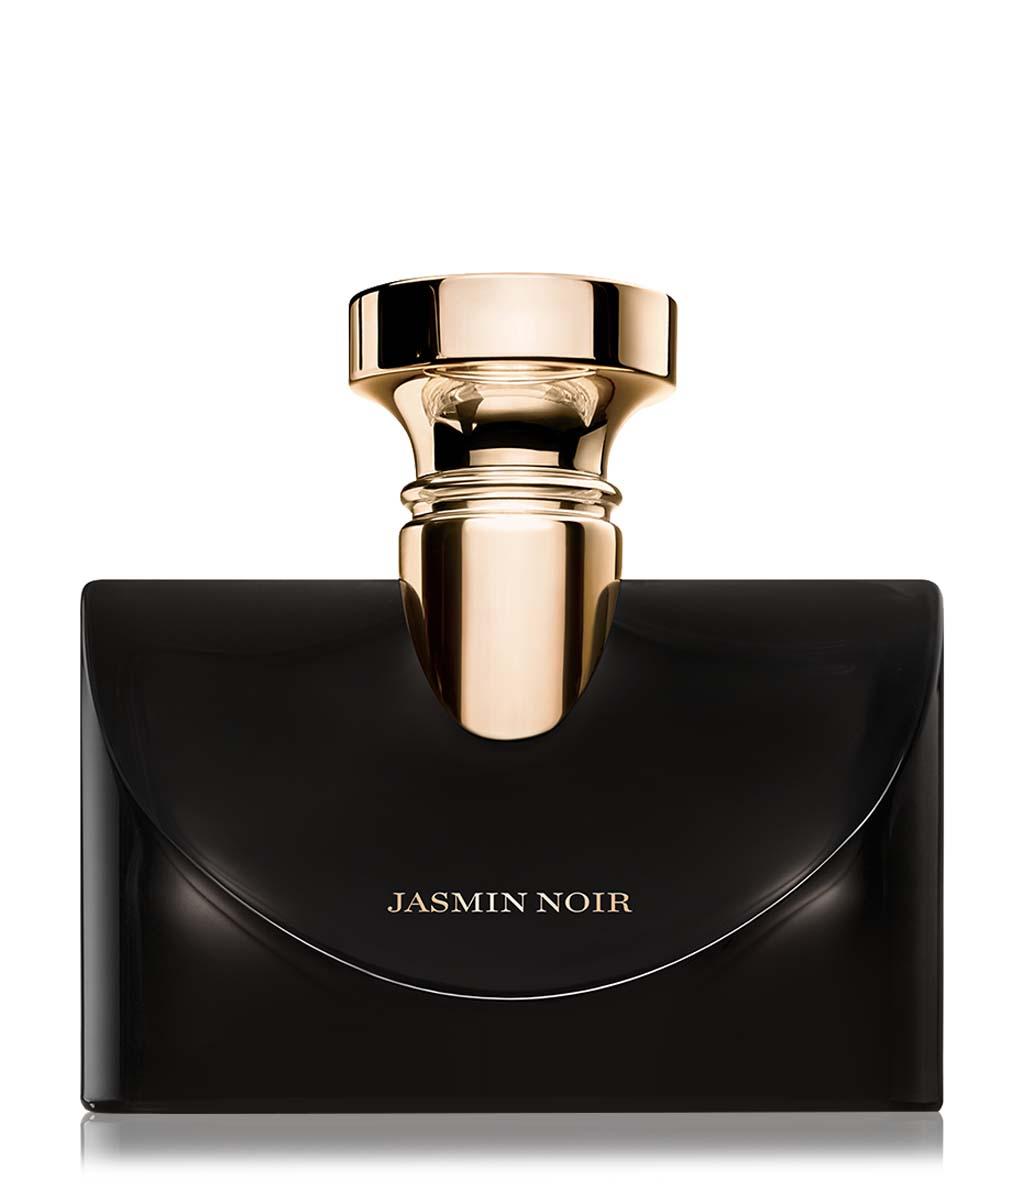 bvlgari splendida jasmin noir eau de parfum bestellen. Black Bedroom Furniture Sets. Home Design Ideas